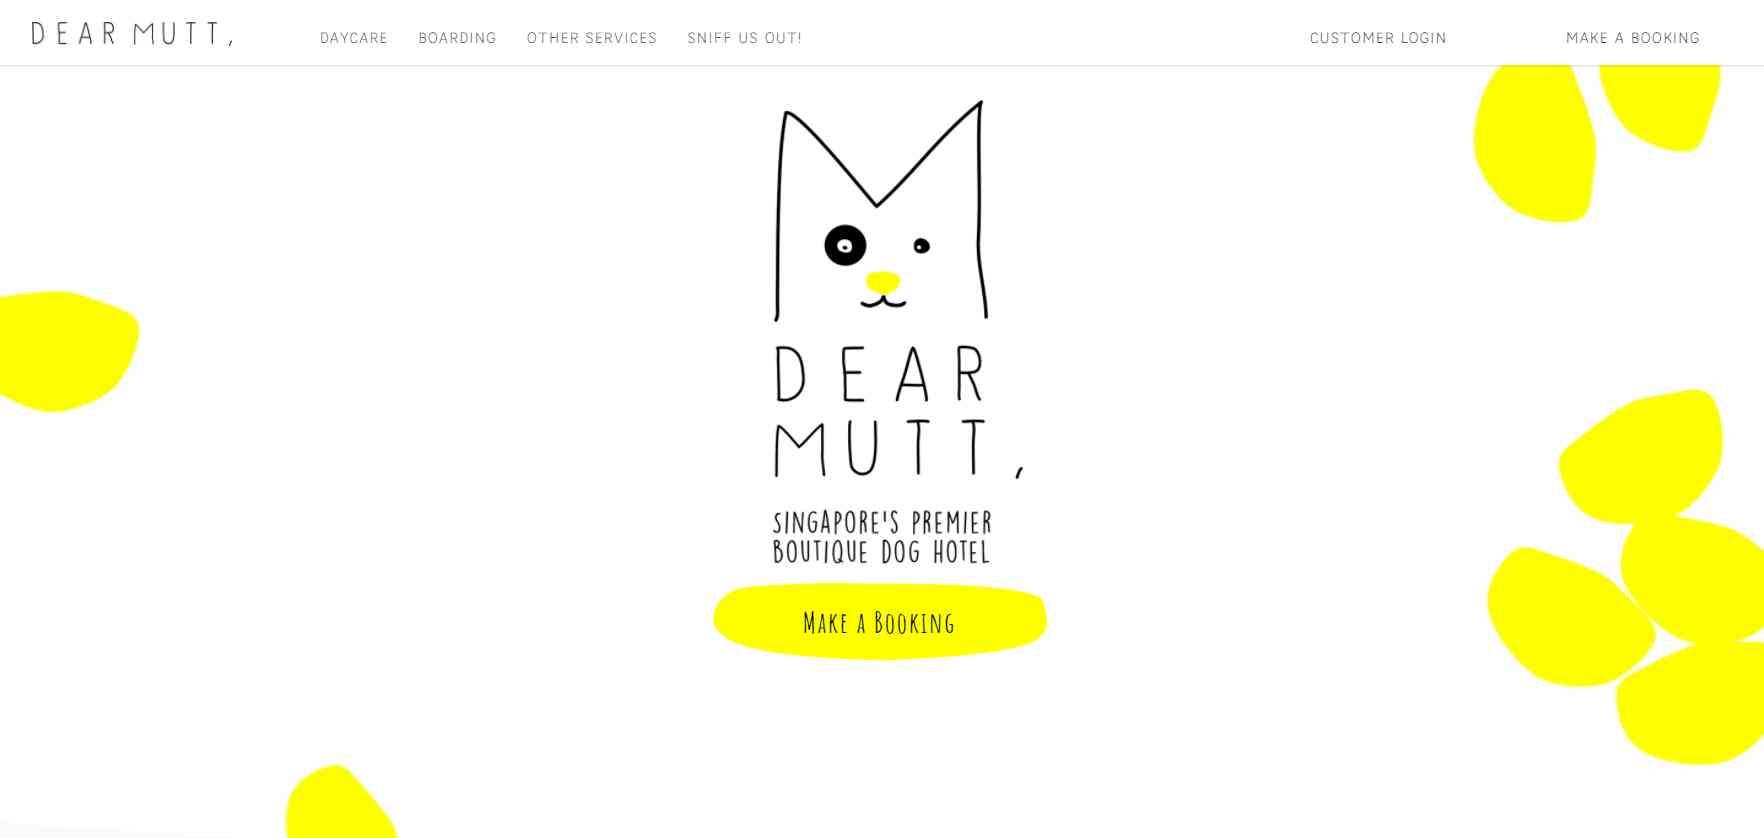 dear mutt Top Dog Boarding Services in Singapore